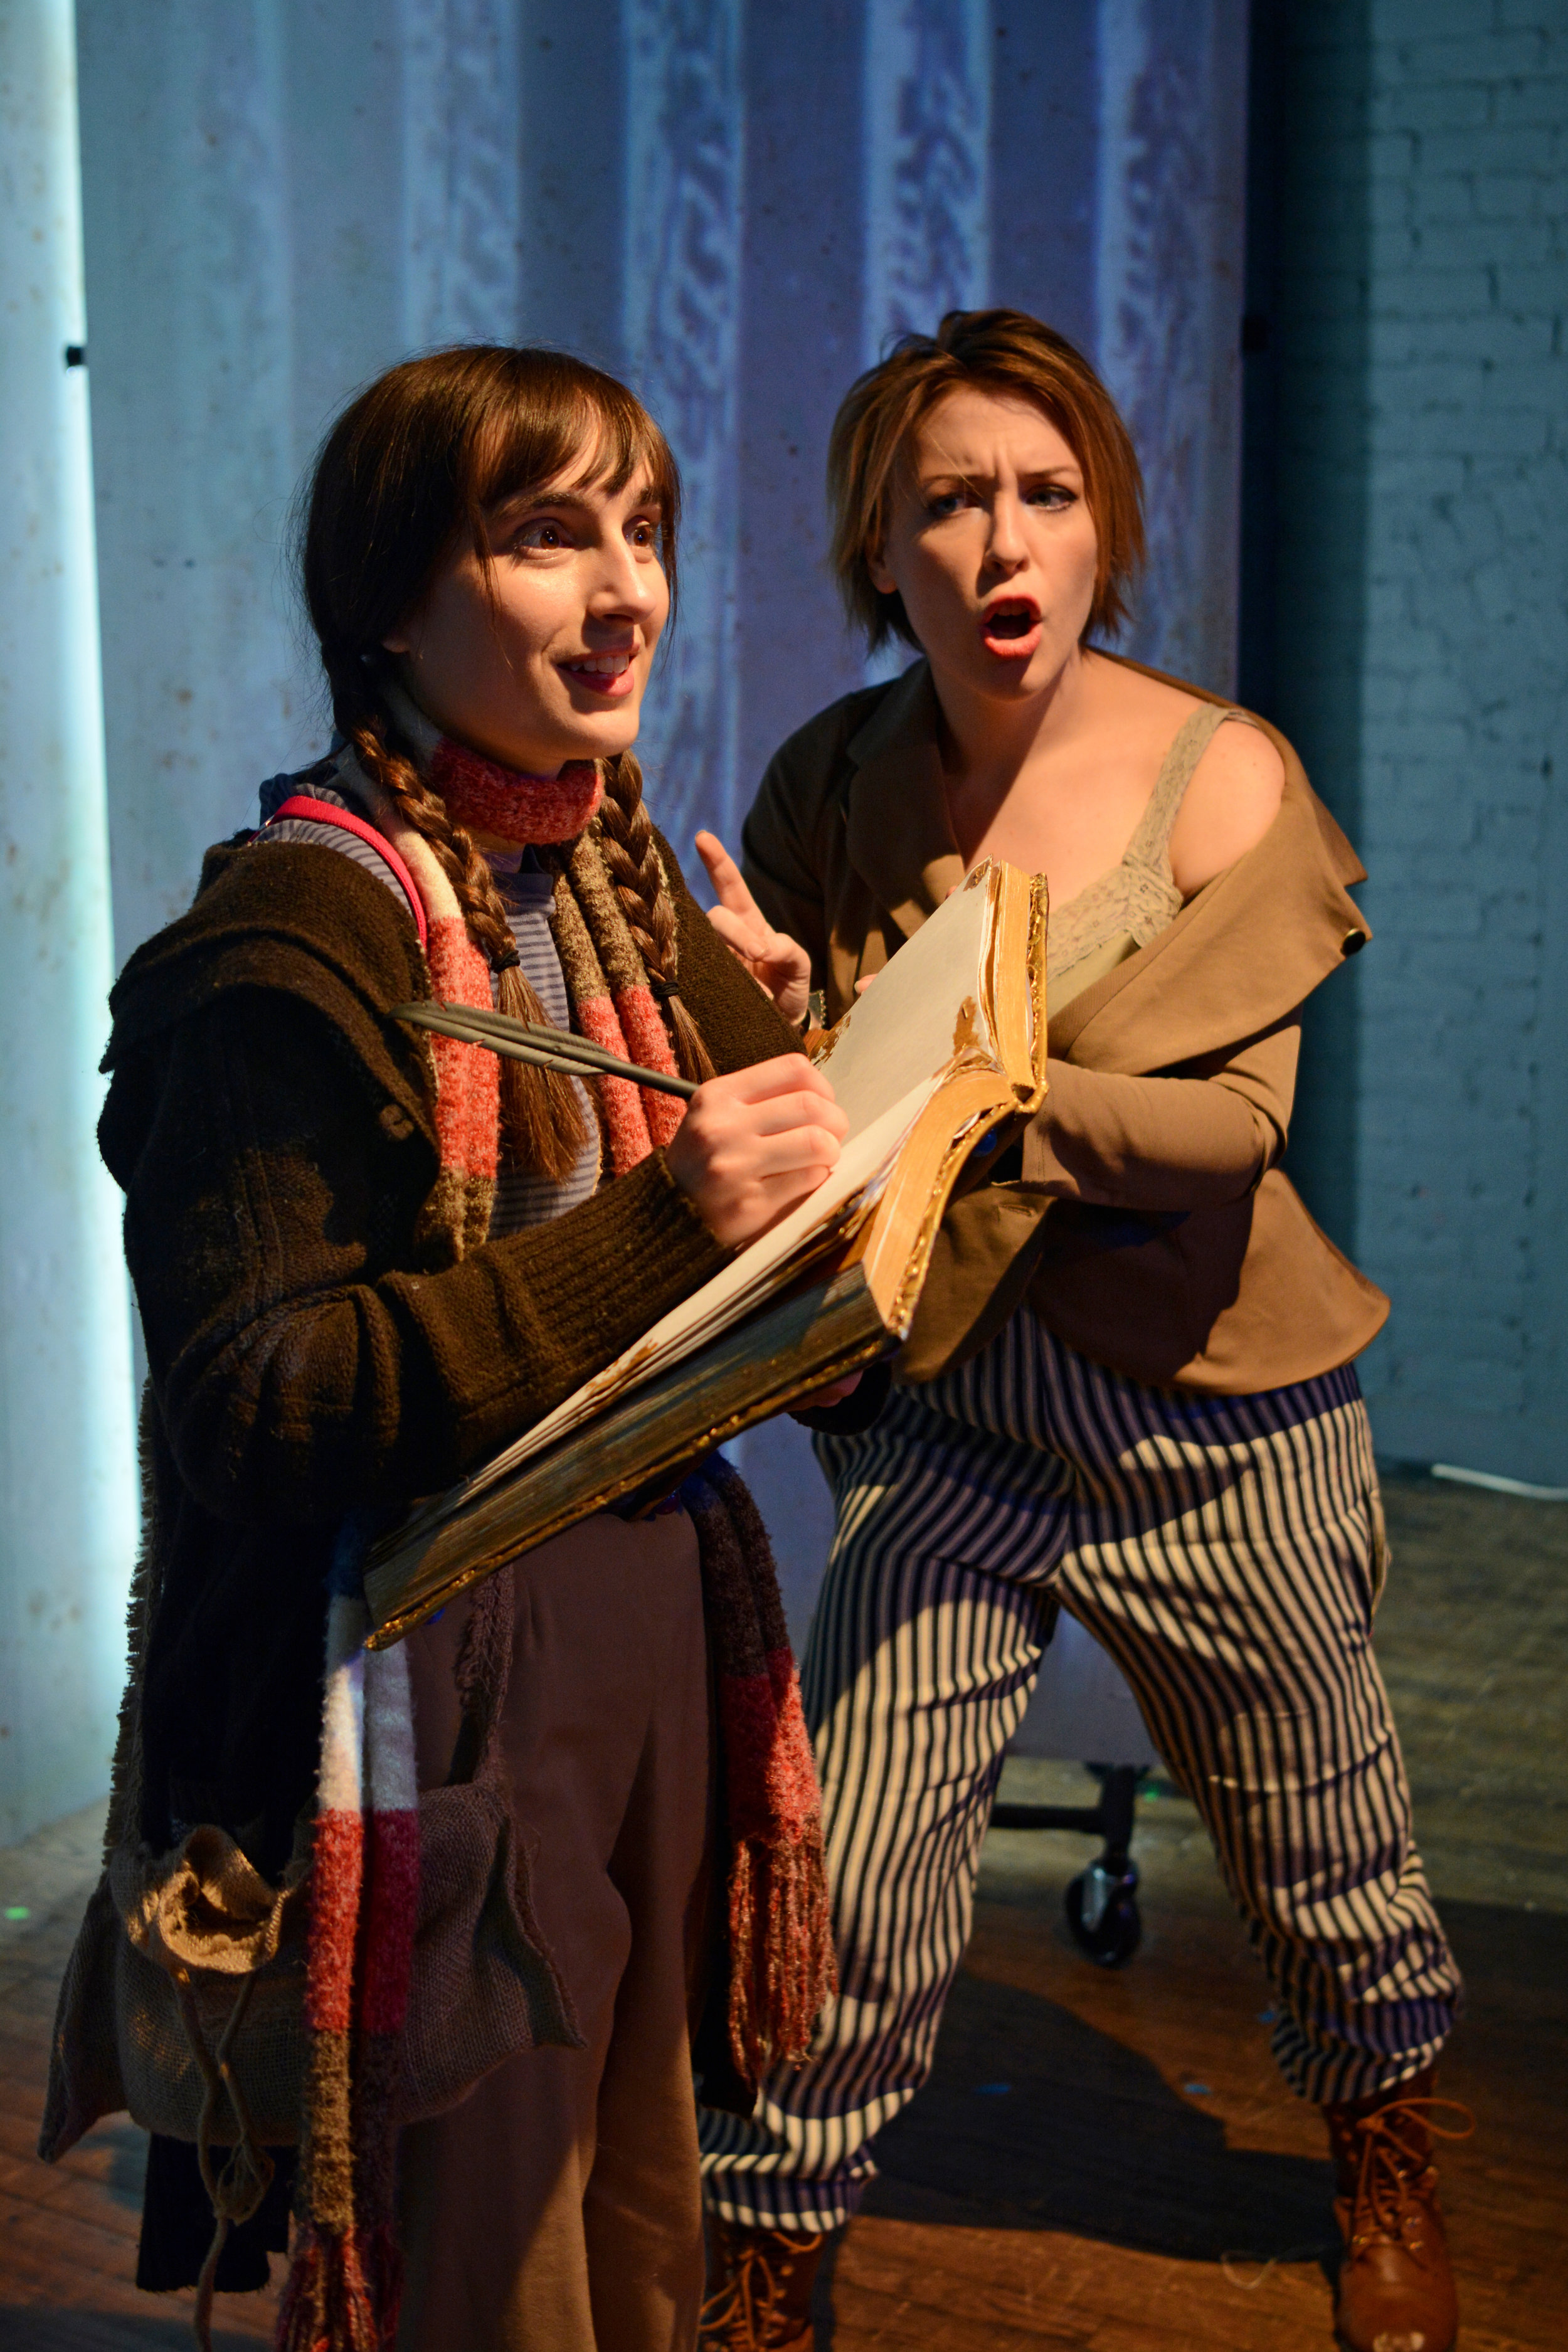 Jennifer Paldino as Isidora and Isabel Kruse as Thornley